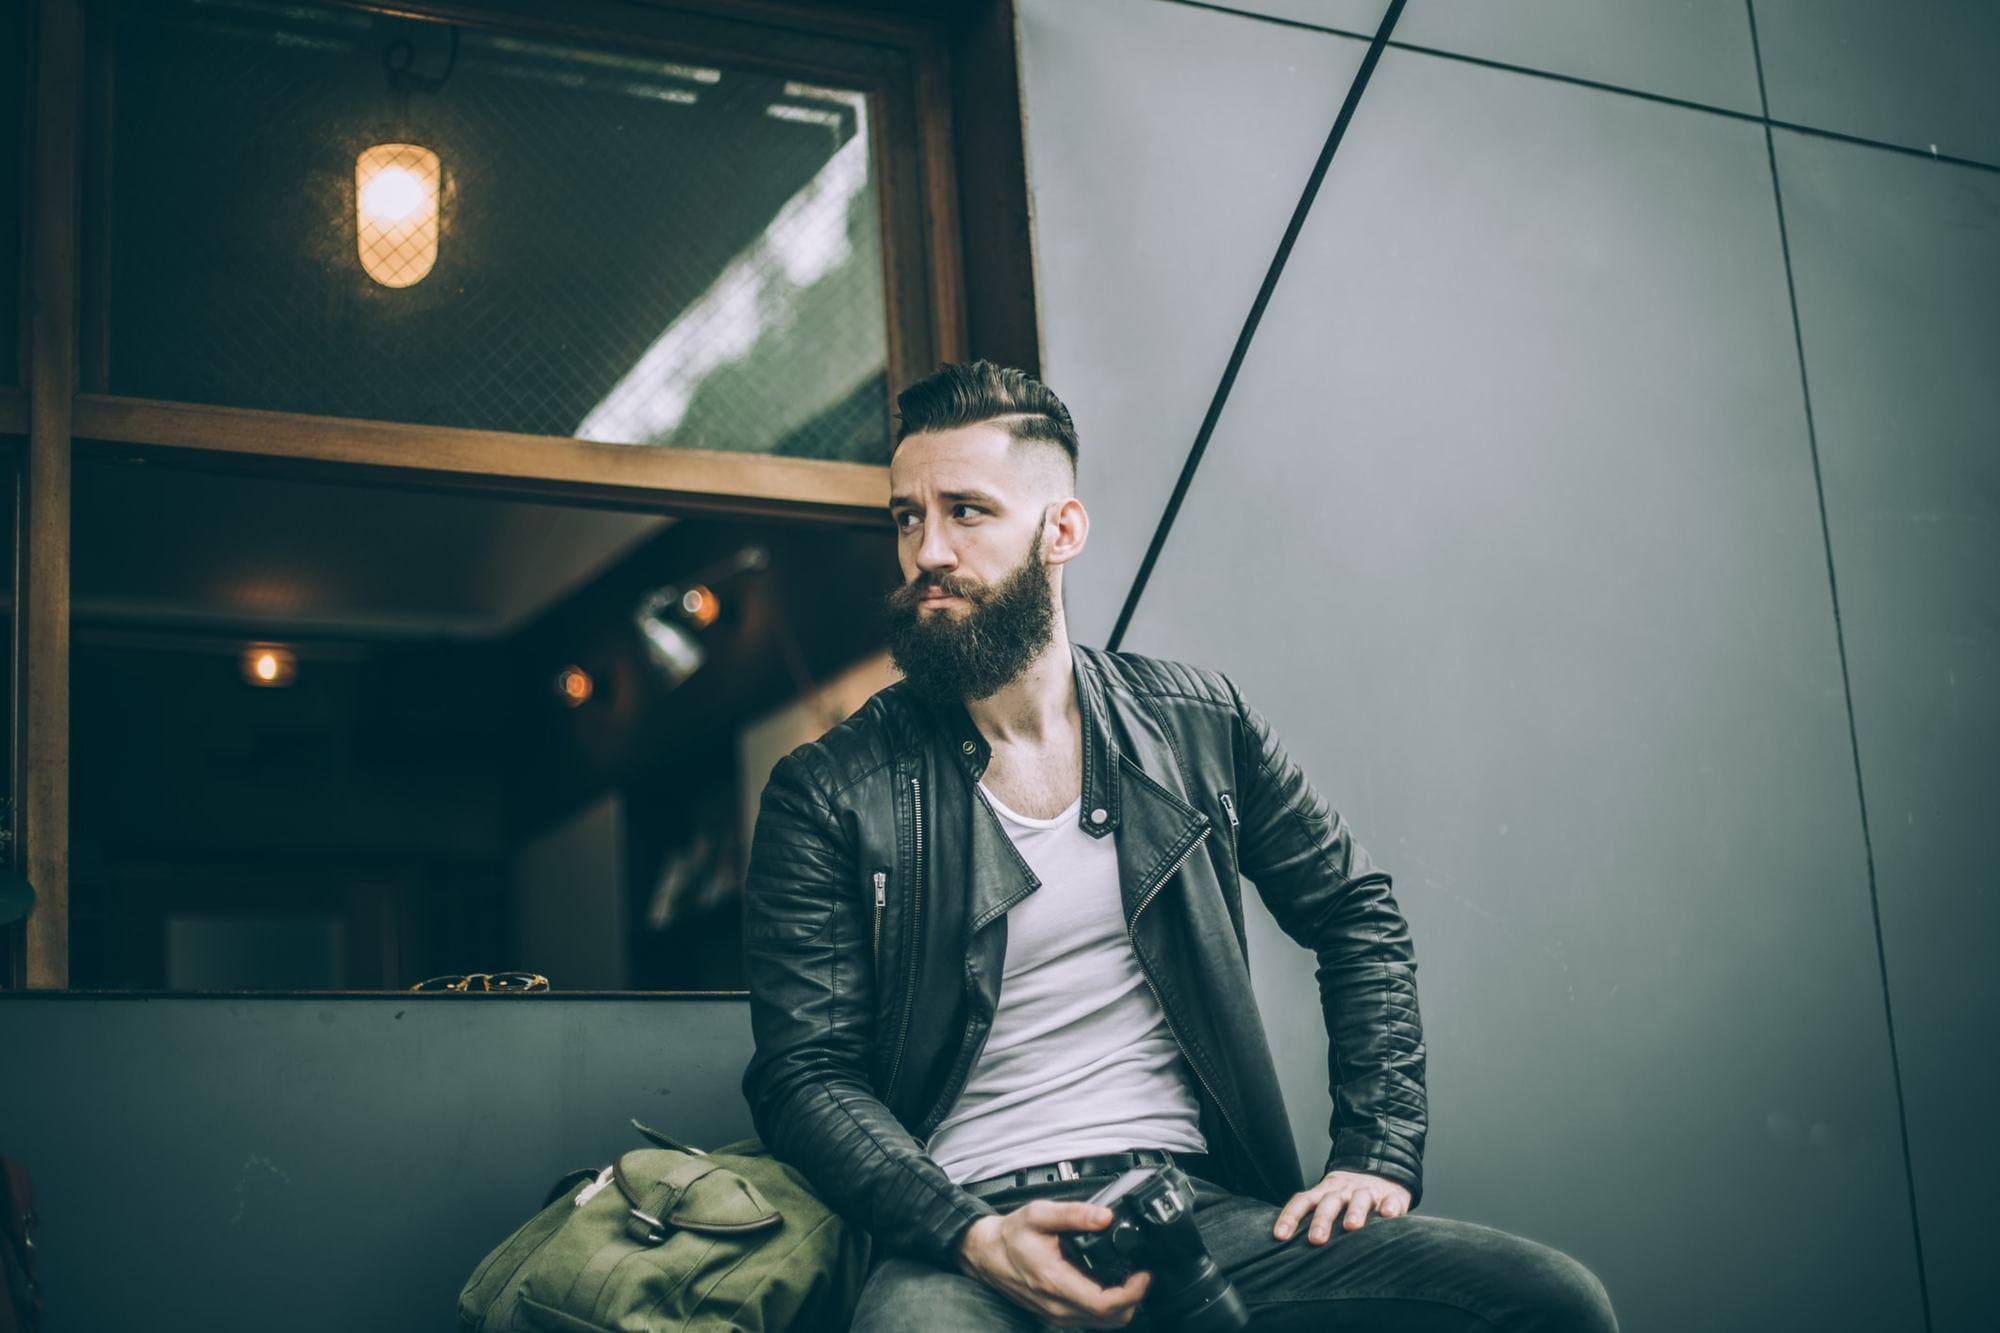 mens hairstyles 2017 classic fade beard